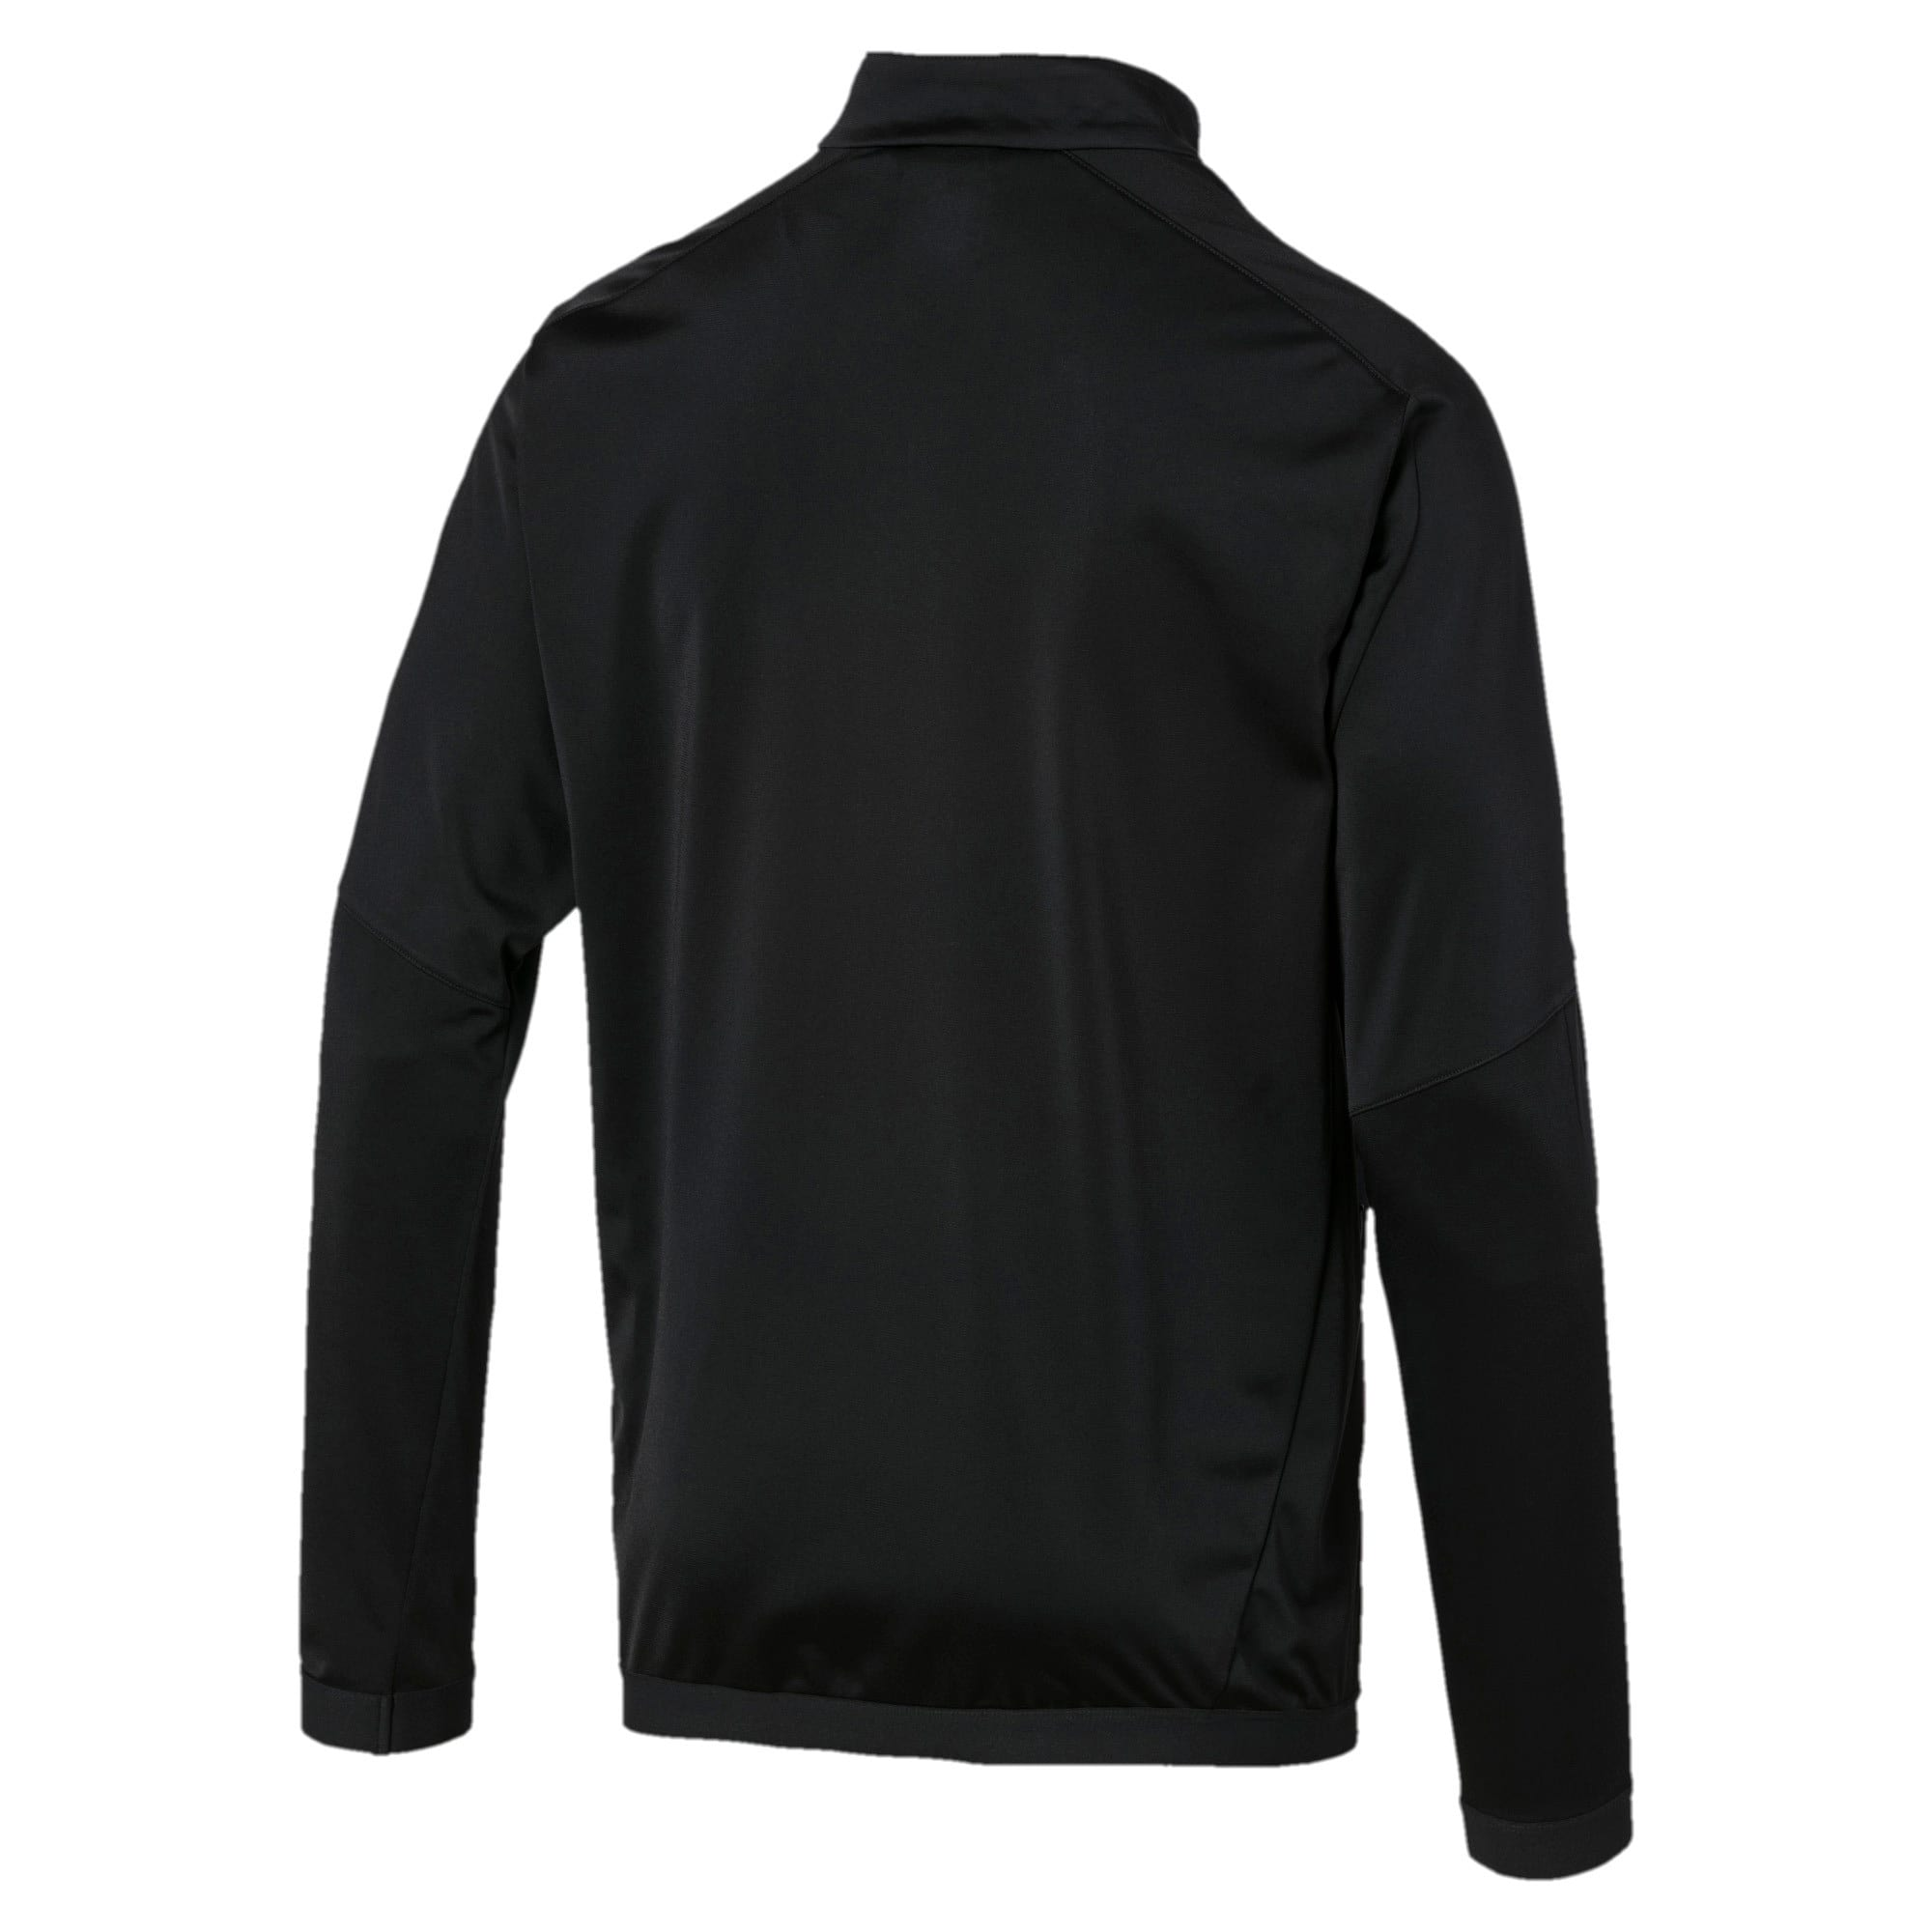 Thumbnail 2 of BVB Men's International Stadium Jacket, Puma Black-Cyber Yellow, medium